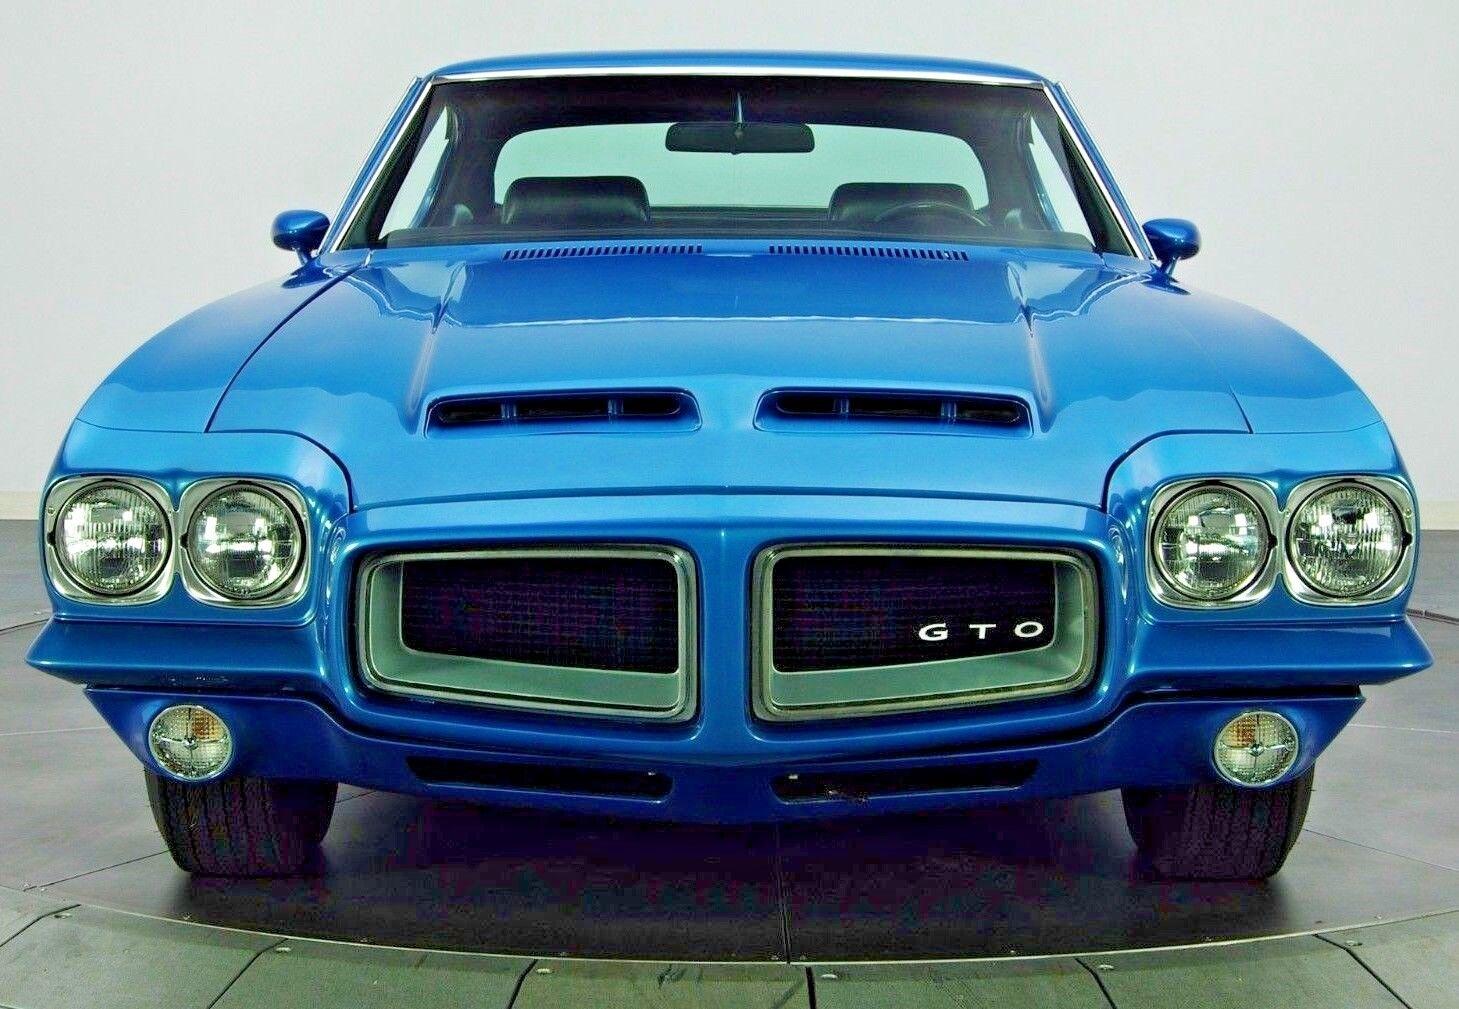 1970s Pontiac Gto 1 Gp F 24 Coche De Carreras Vintage Sport Racer 12 Dragster Metal 18